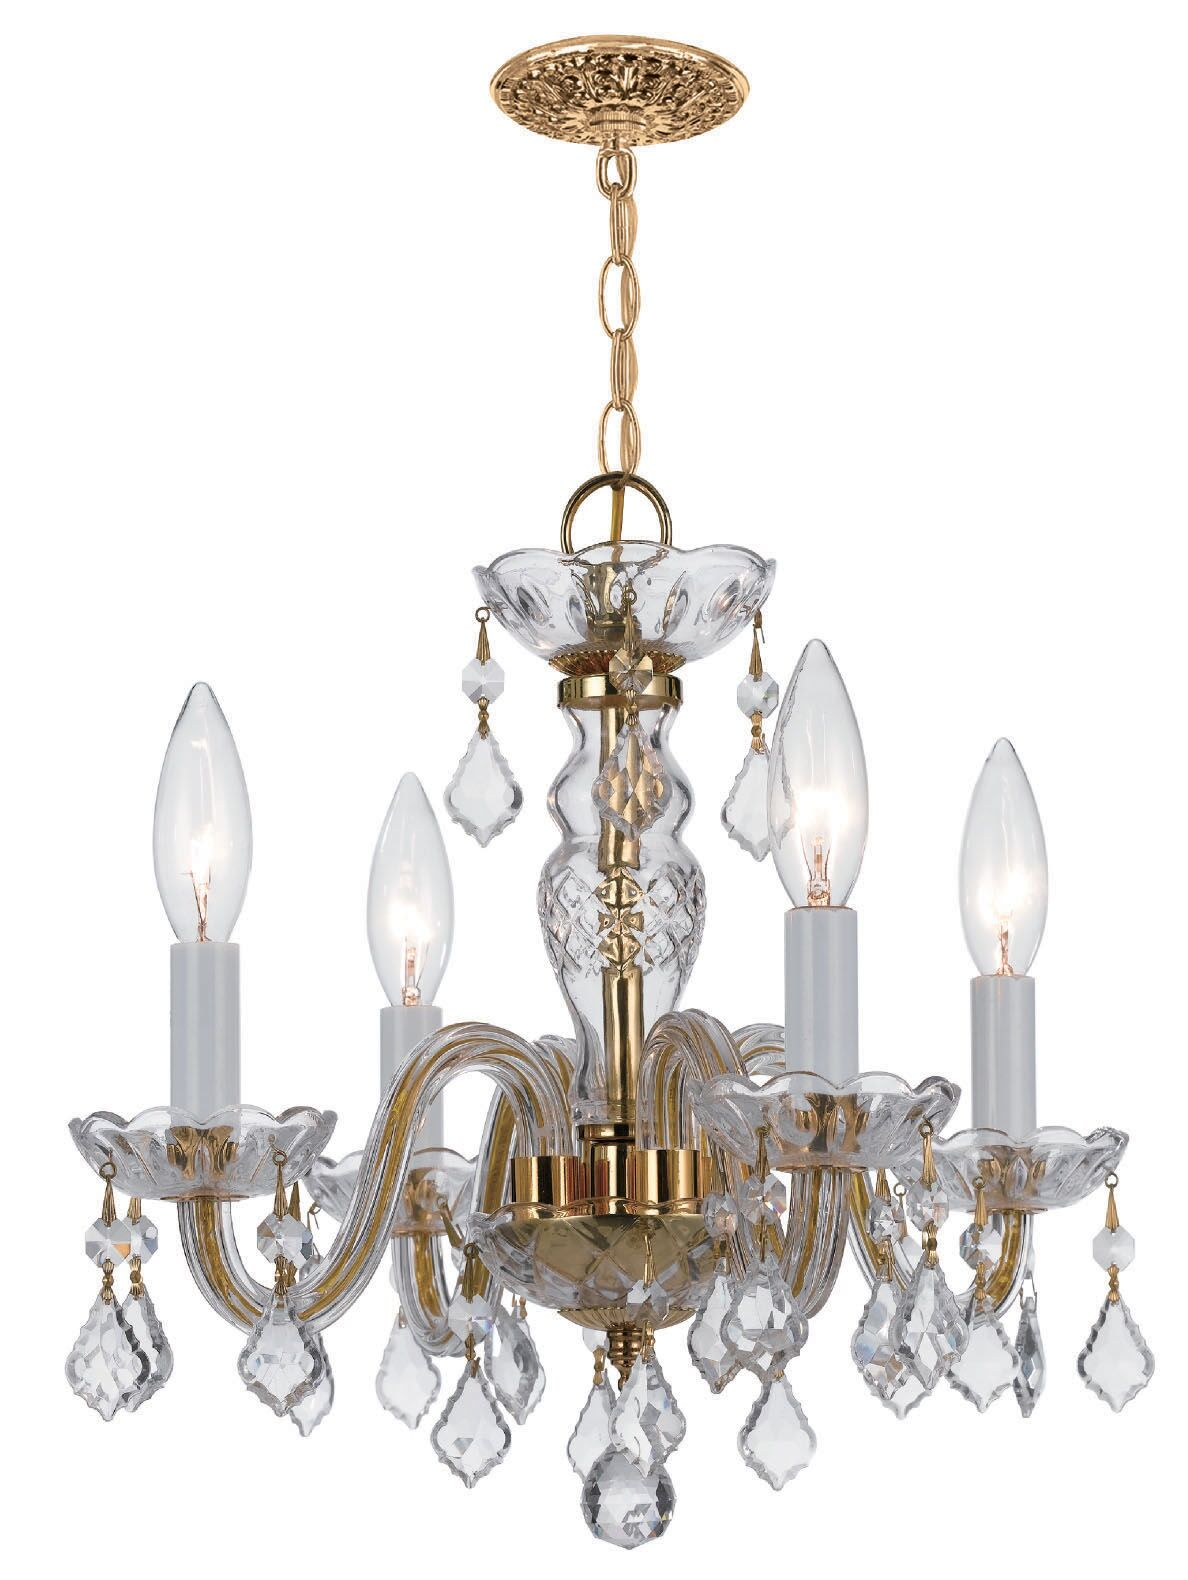 Careen 4-Light Candle Style Chandelier Finish: Polished Chrome, Crystal Type: Swarovski Elements